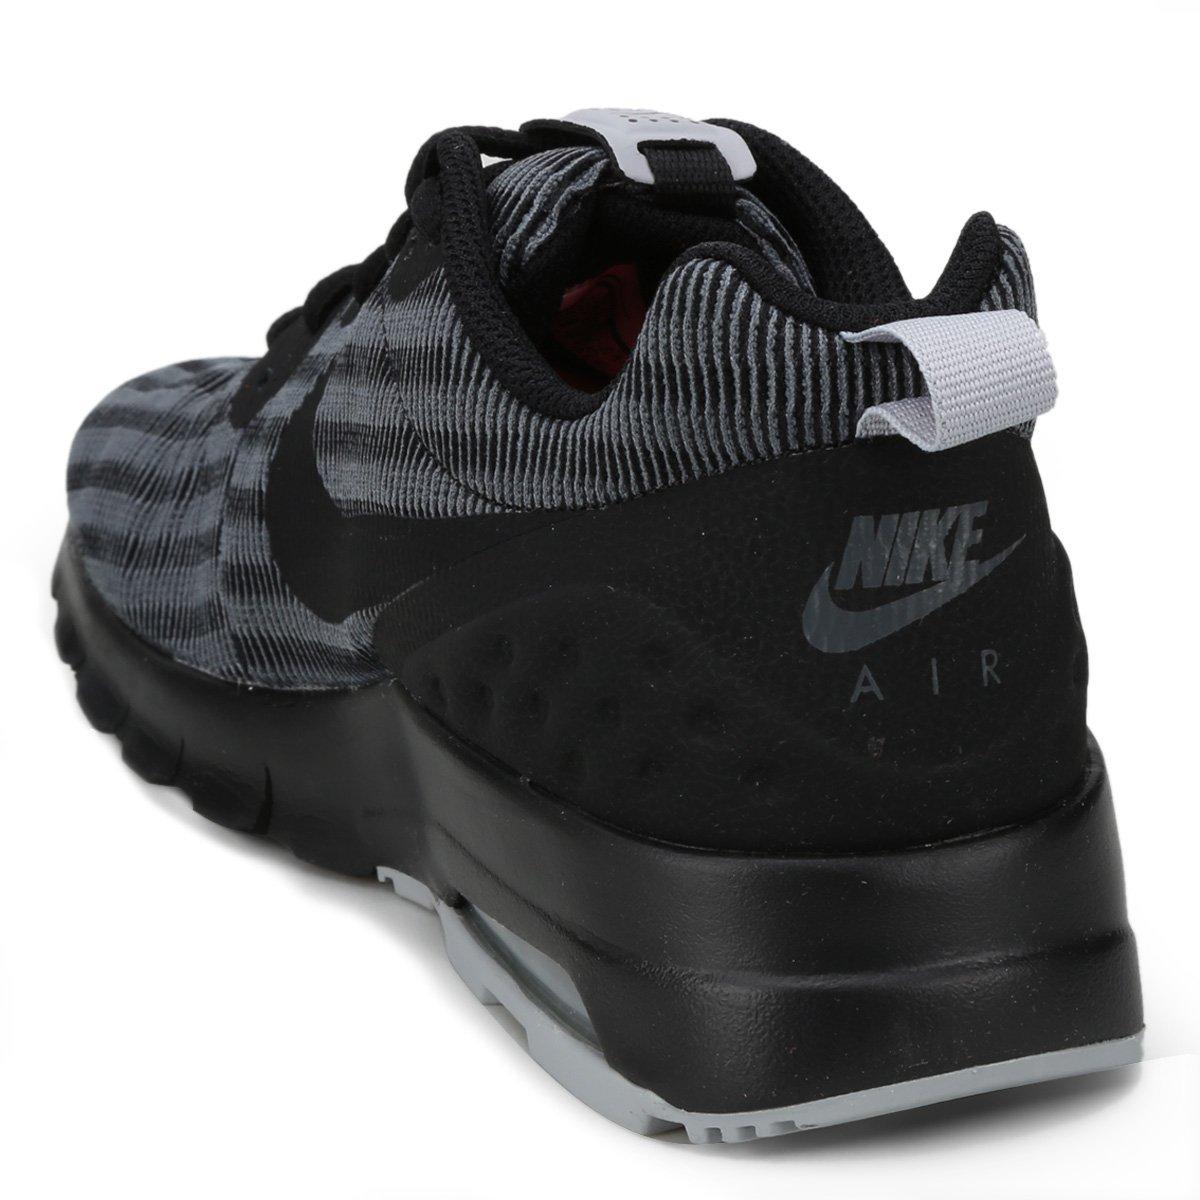 Tênis Nike Air Max Motion Lw Se Feminino - Compre Agora  aa2c113cd3fc6